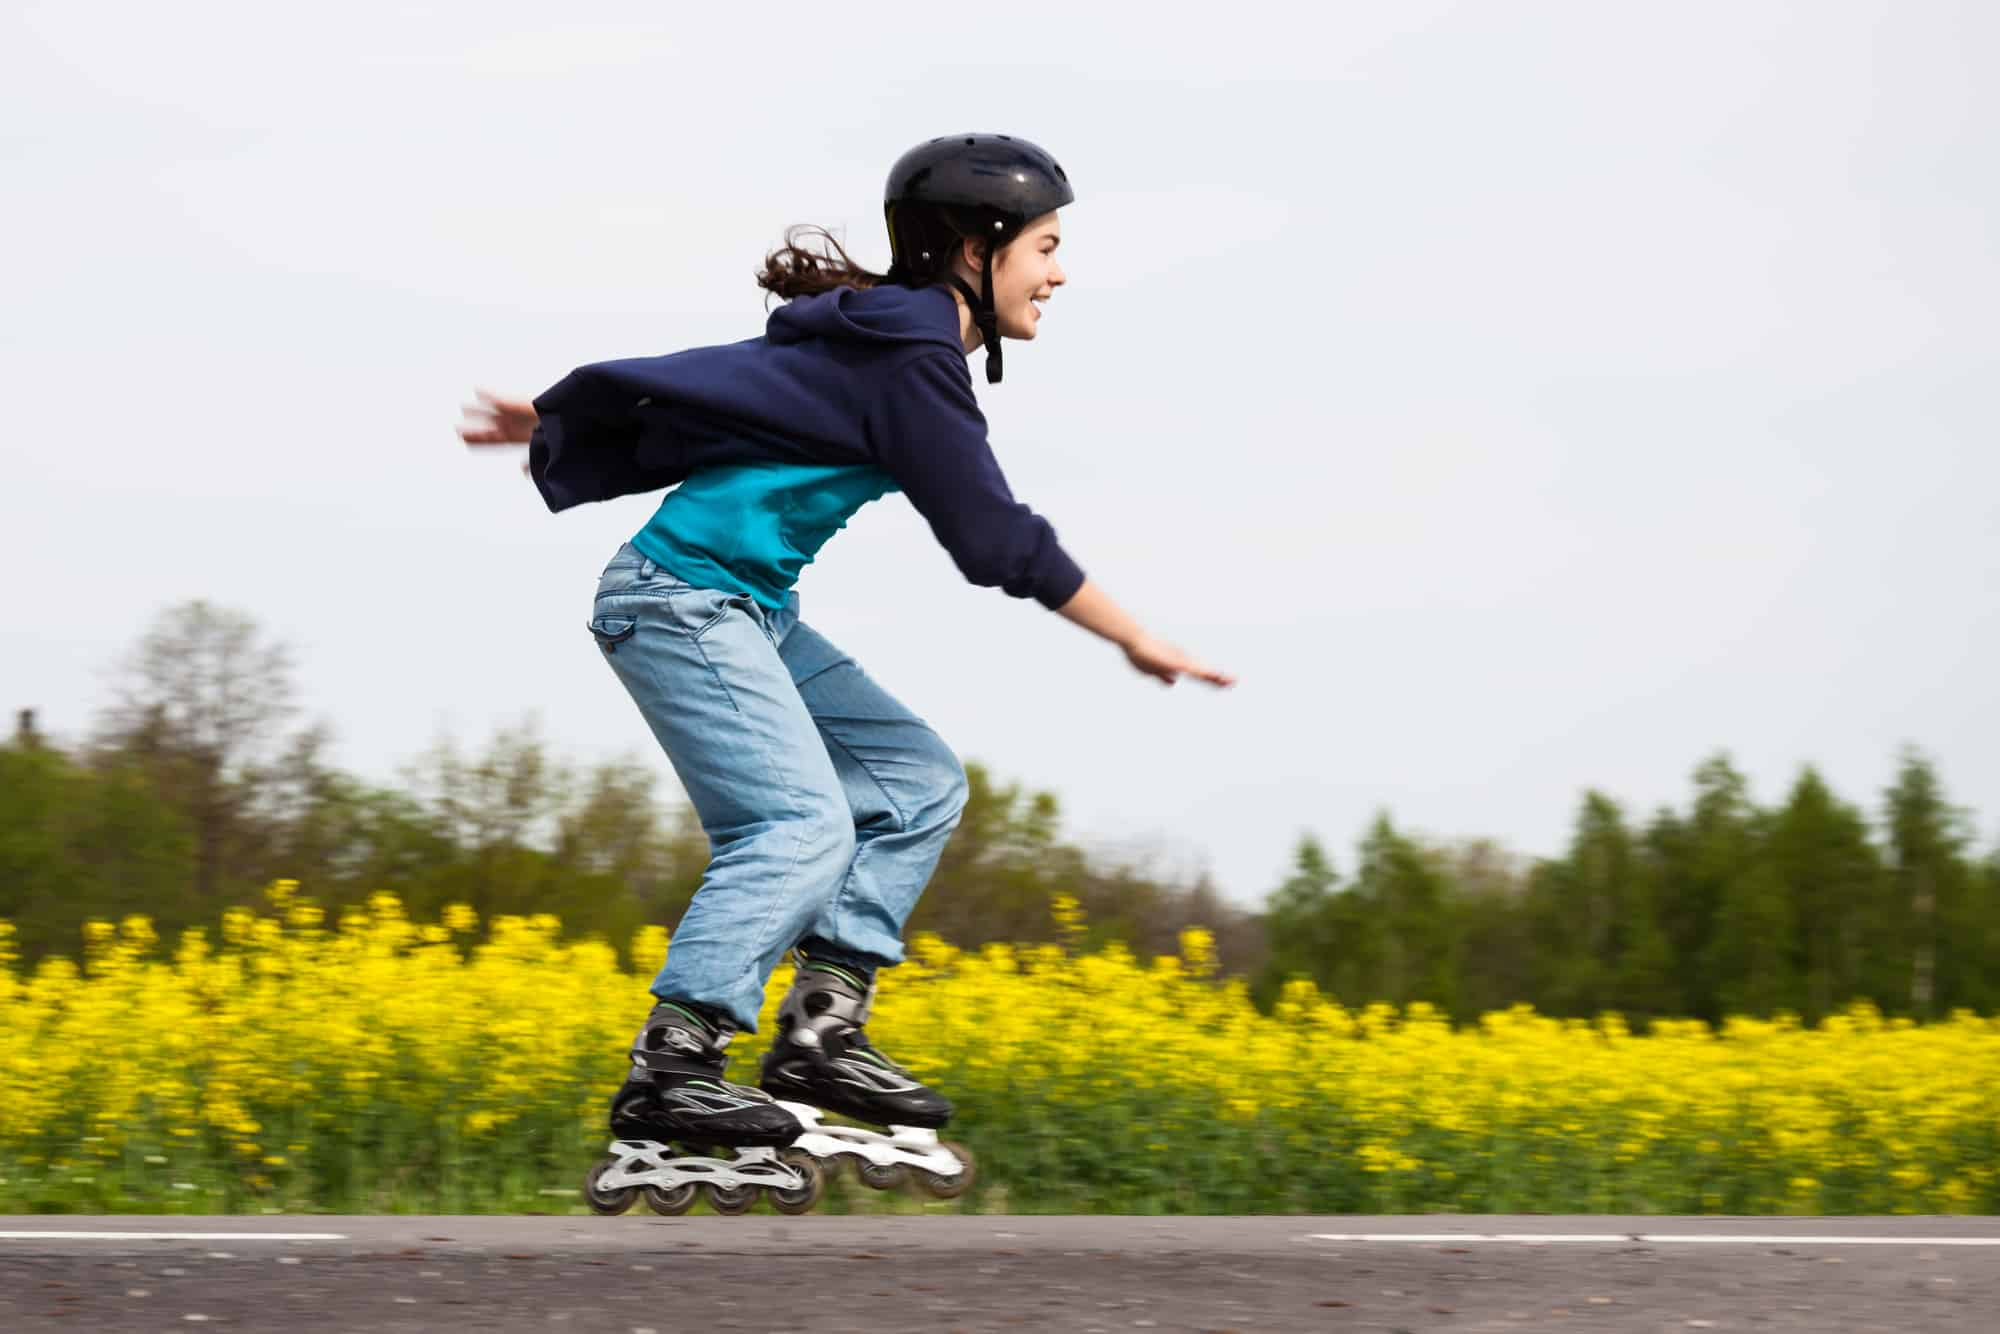 rollerblading benefits